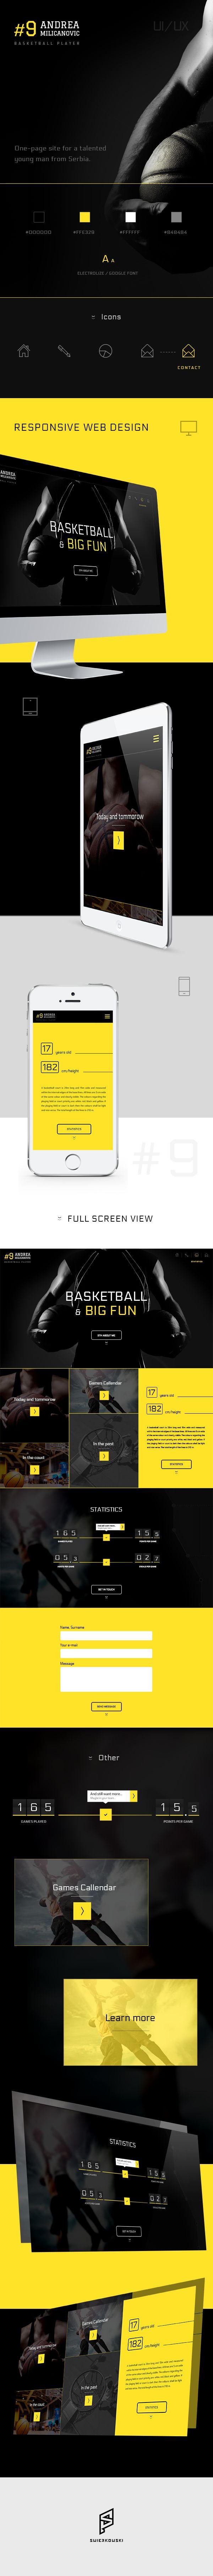 Cool Web Design, Andrea Milicanovic. #webdesign #webdevelopment [http://www.pinterest.com/alfredchong/]